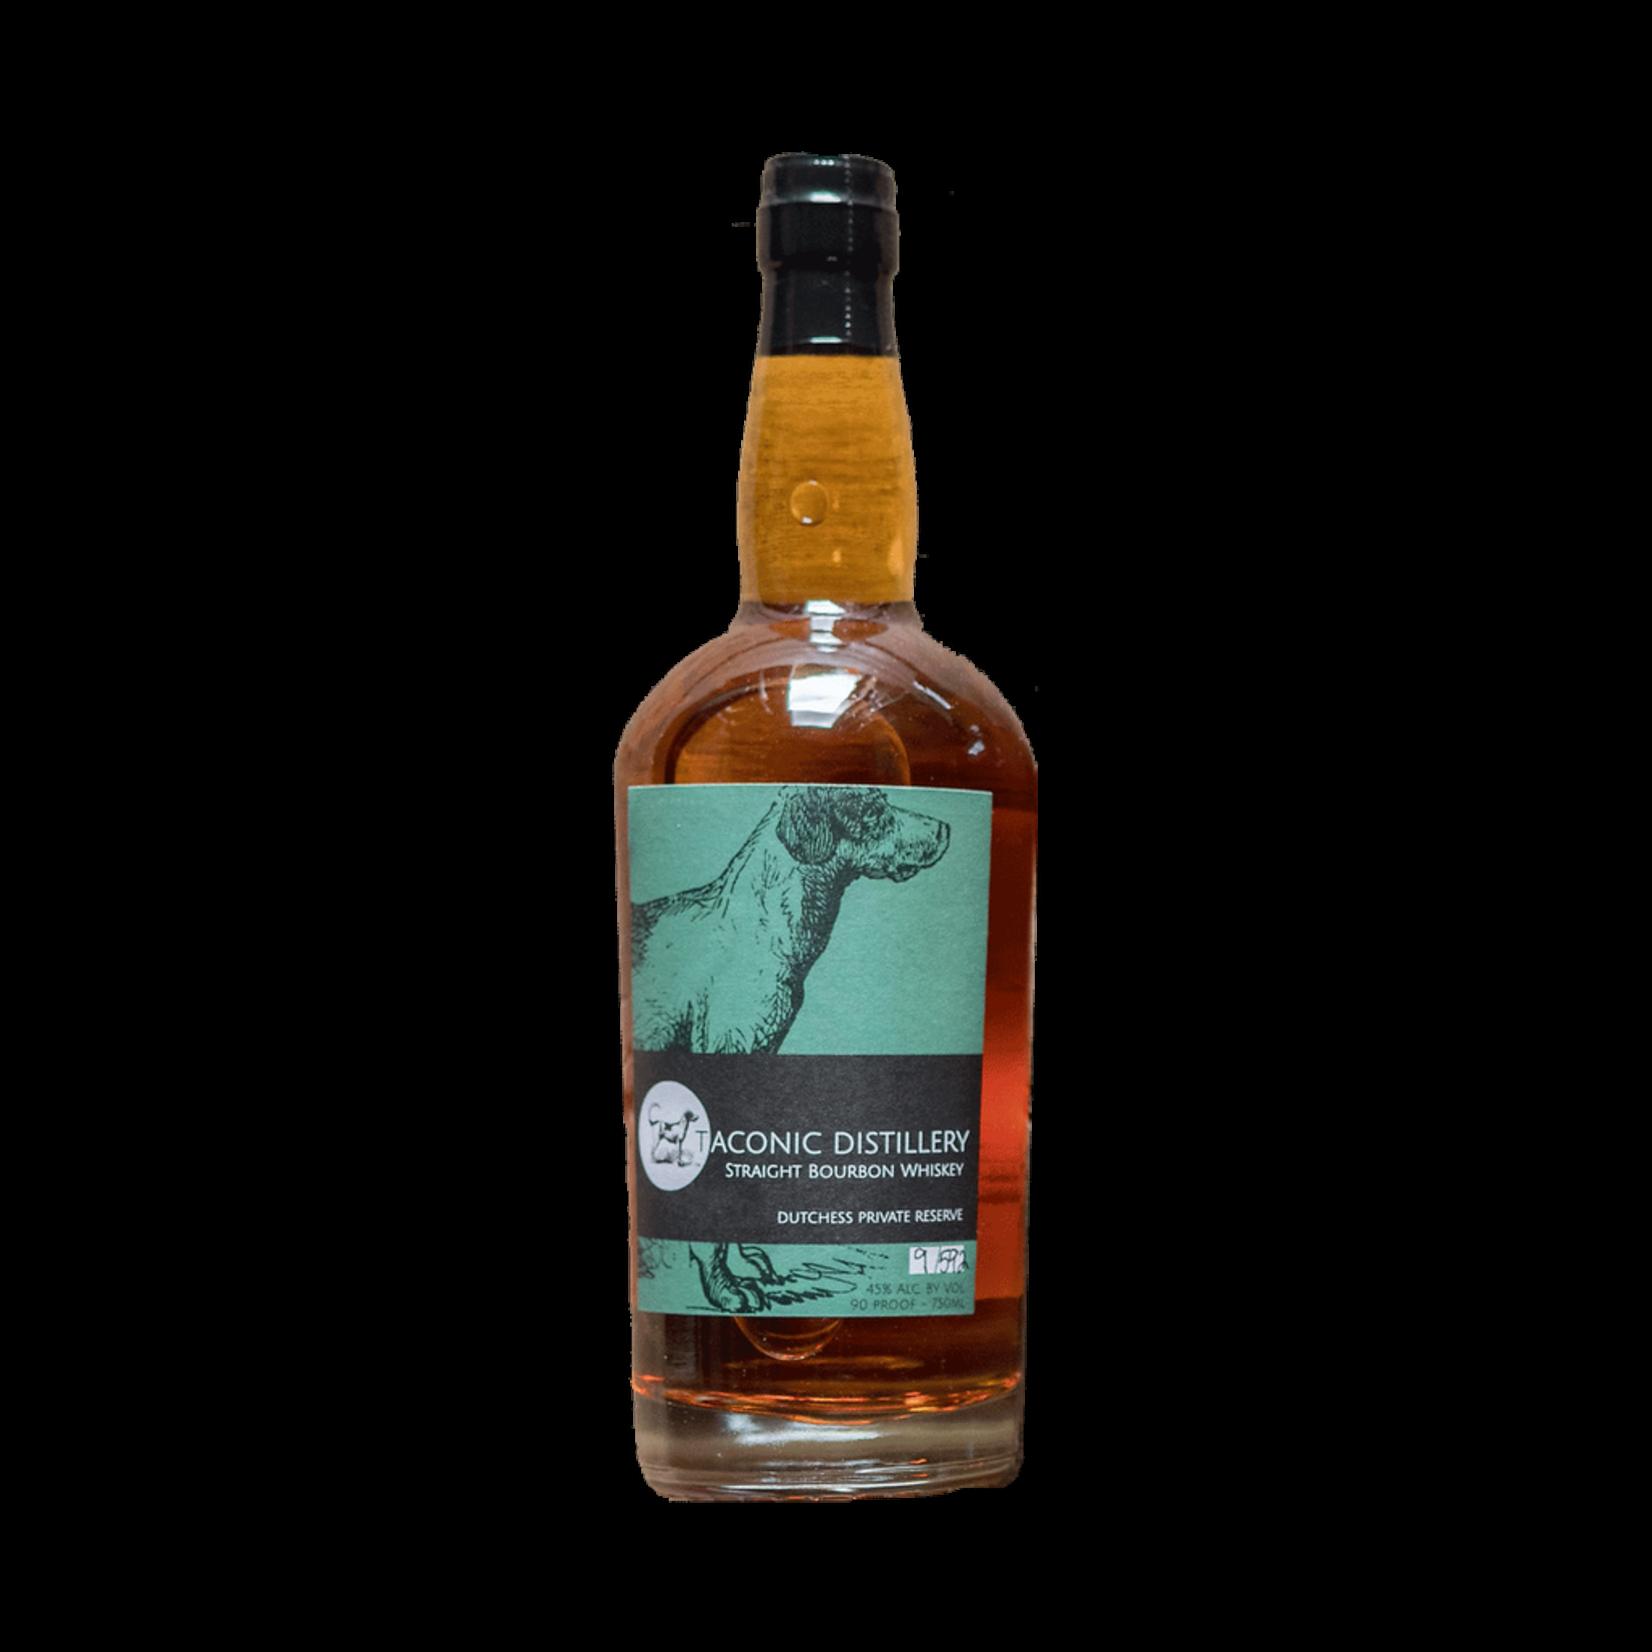 Spirits Taconic Distillery Straight Bourbon Dutchess Private Reserve